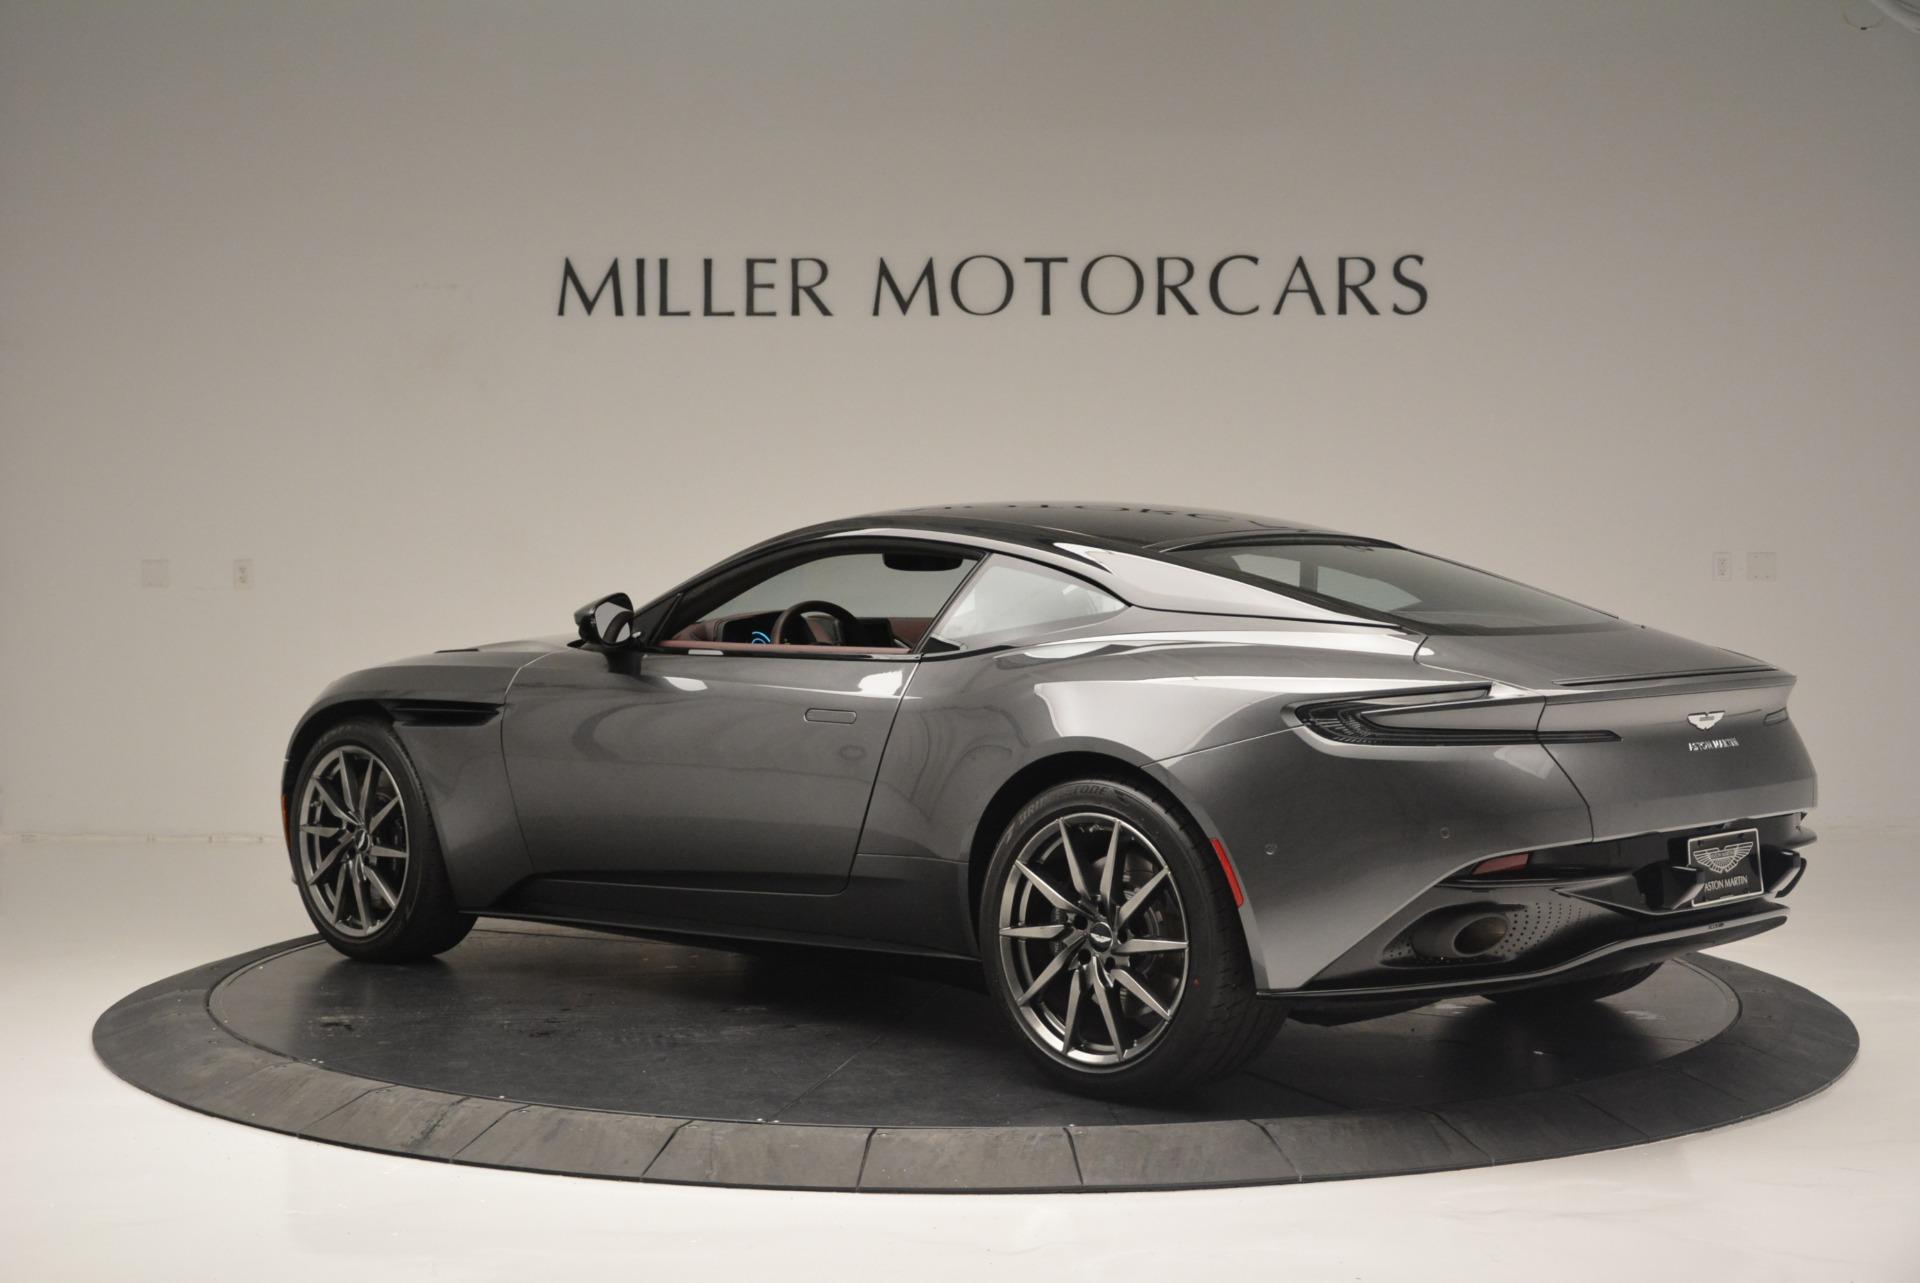 New 2018 Aston Martin DB11 V12 Coupe For Sale In Greenwich, CT. Alfa Romeo of Greenwich, A1274 2364_p4